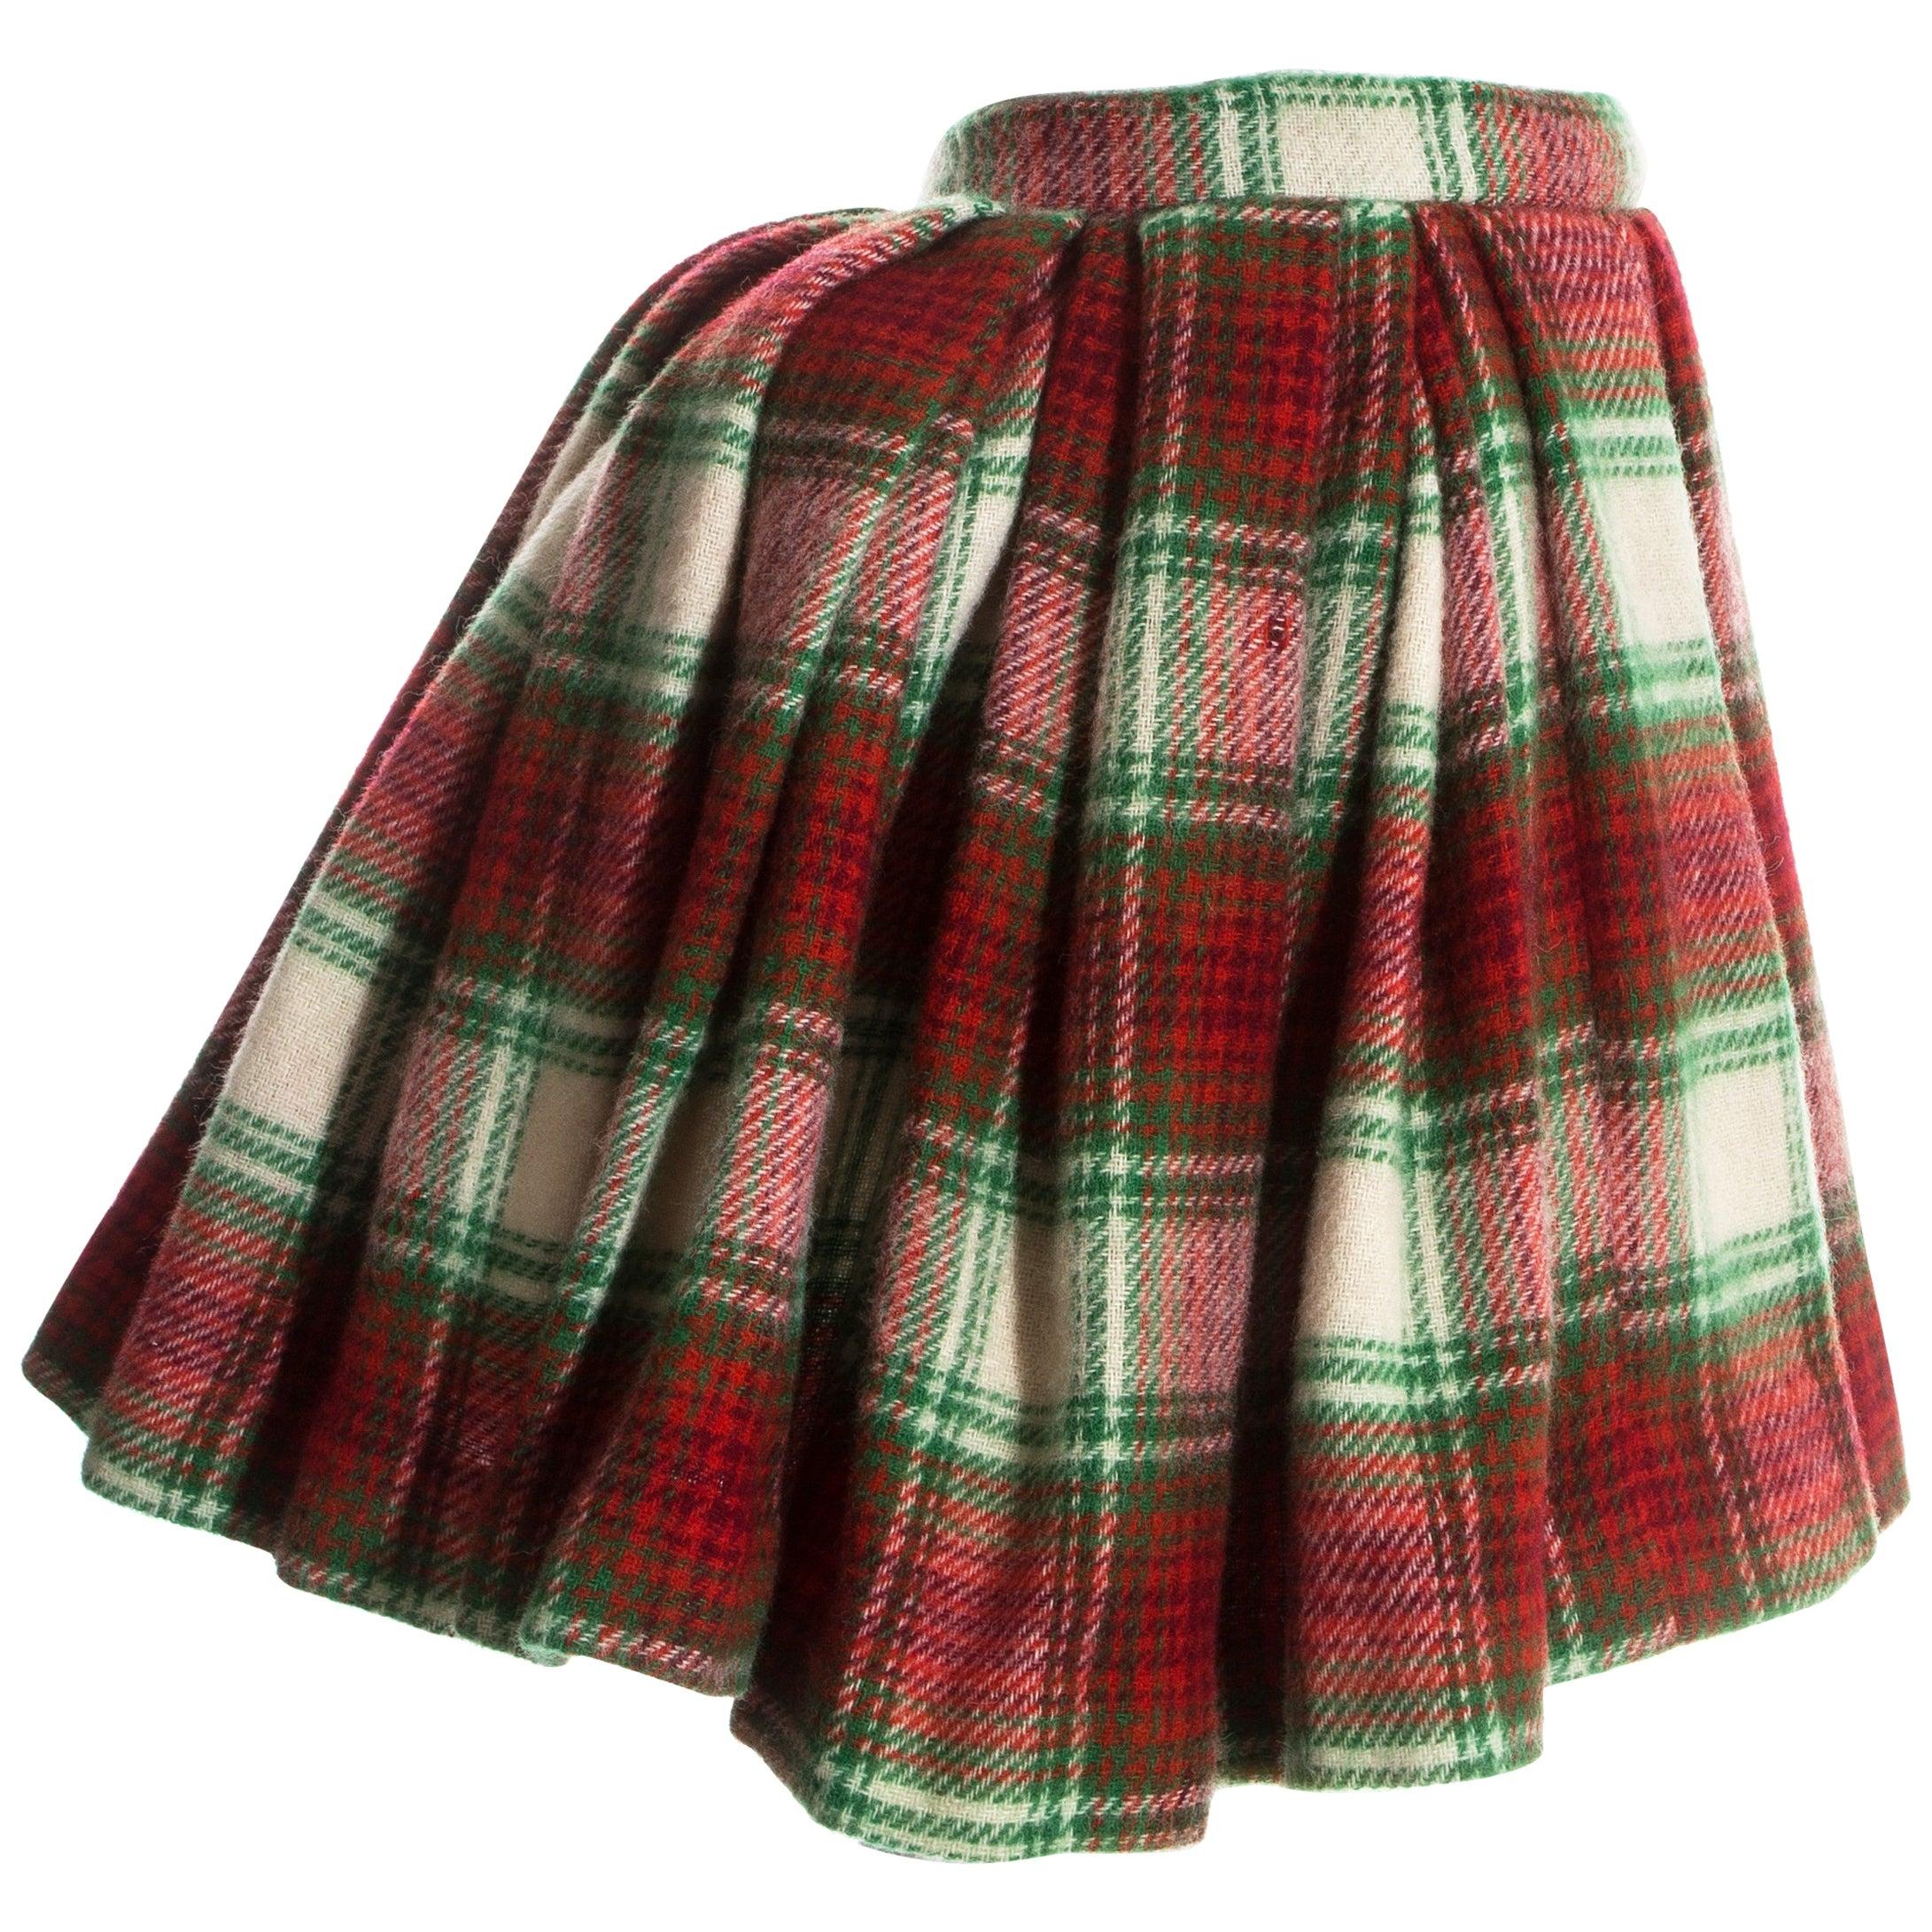 Vivienne Westwood red tartan wool pleated skirt with bustle, fw 1988